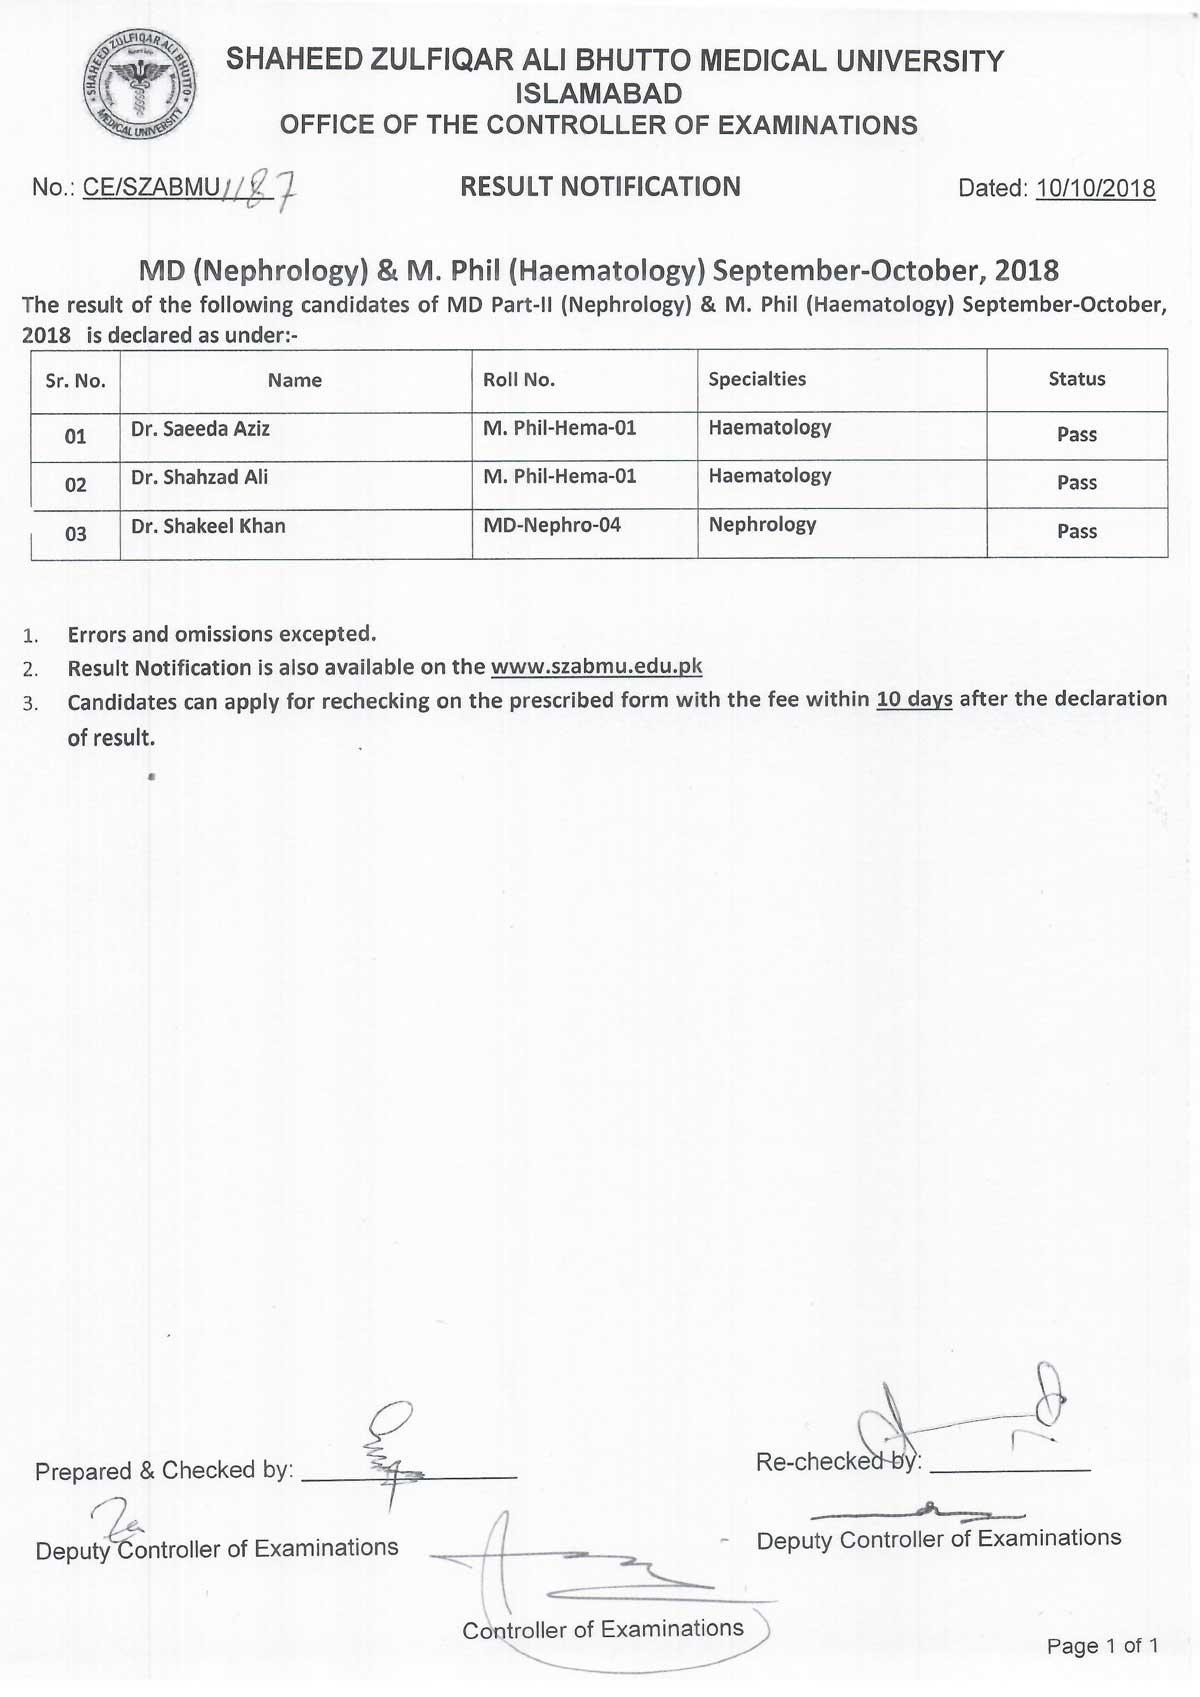 Result Notification - MD Nephrology & M.Phil Haematology Examination September - October 2018